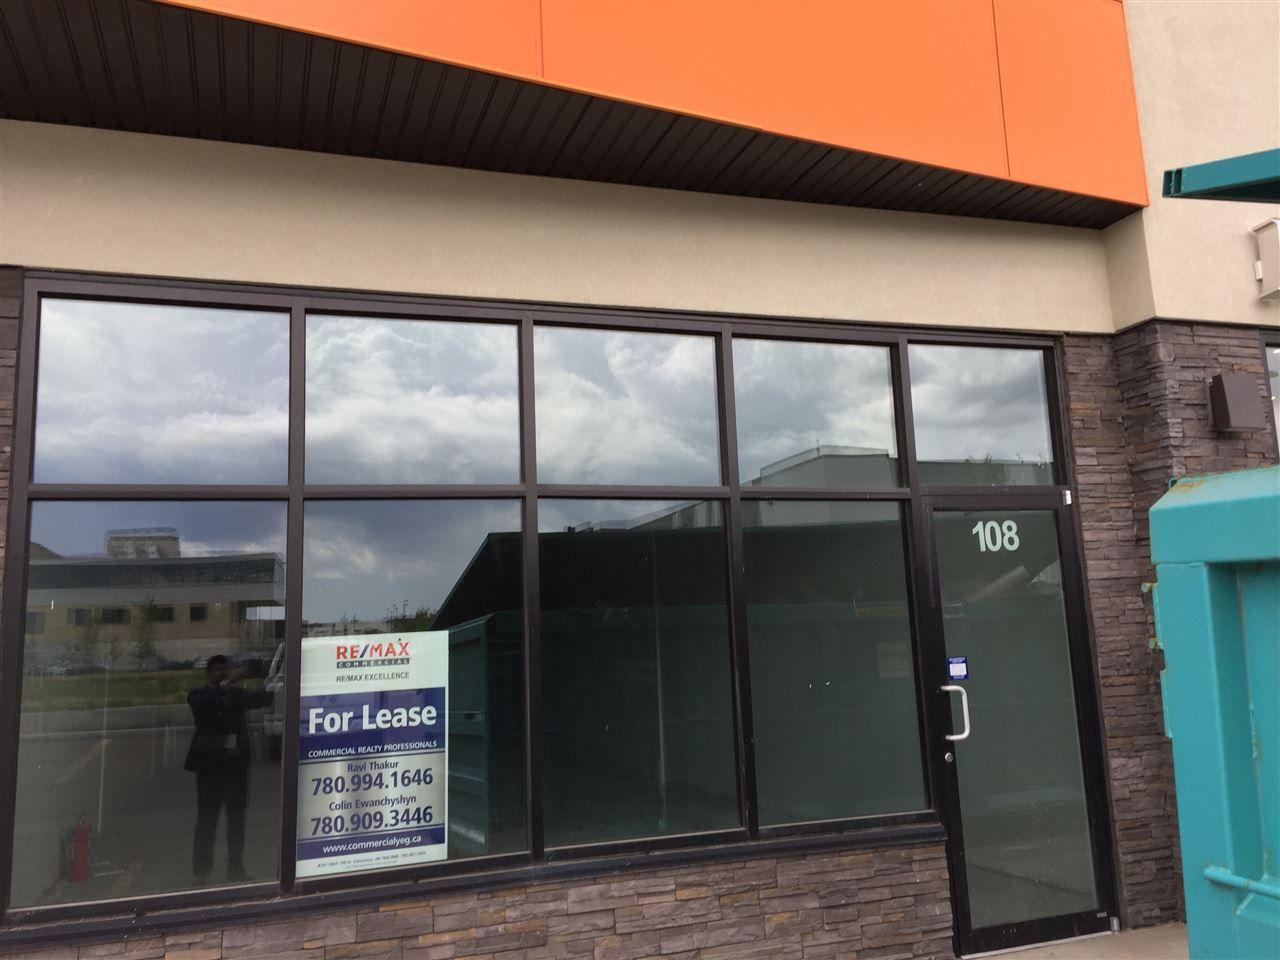 Main Photo: 108 1803 91 street in Edmonton: Zone 53 Retail for sale : MLS®# E4133578